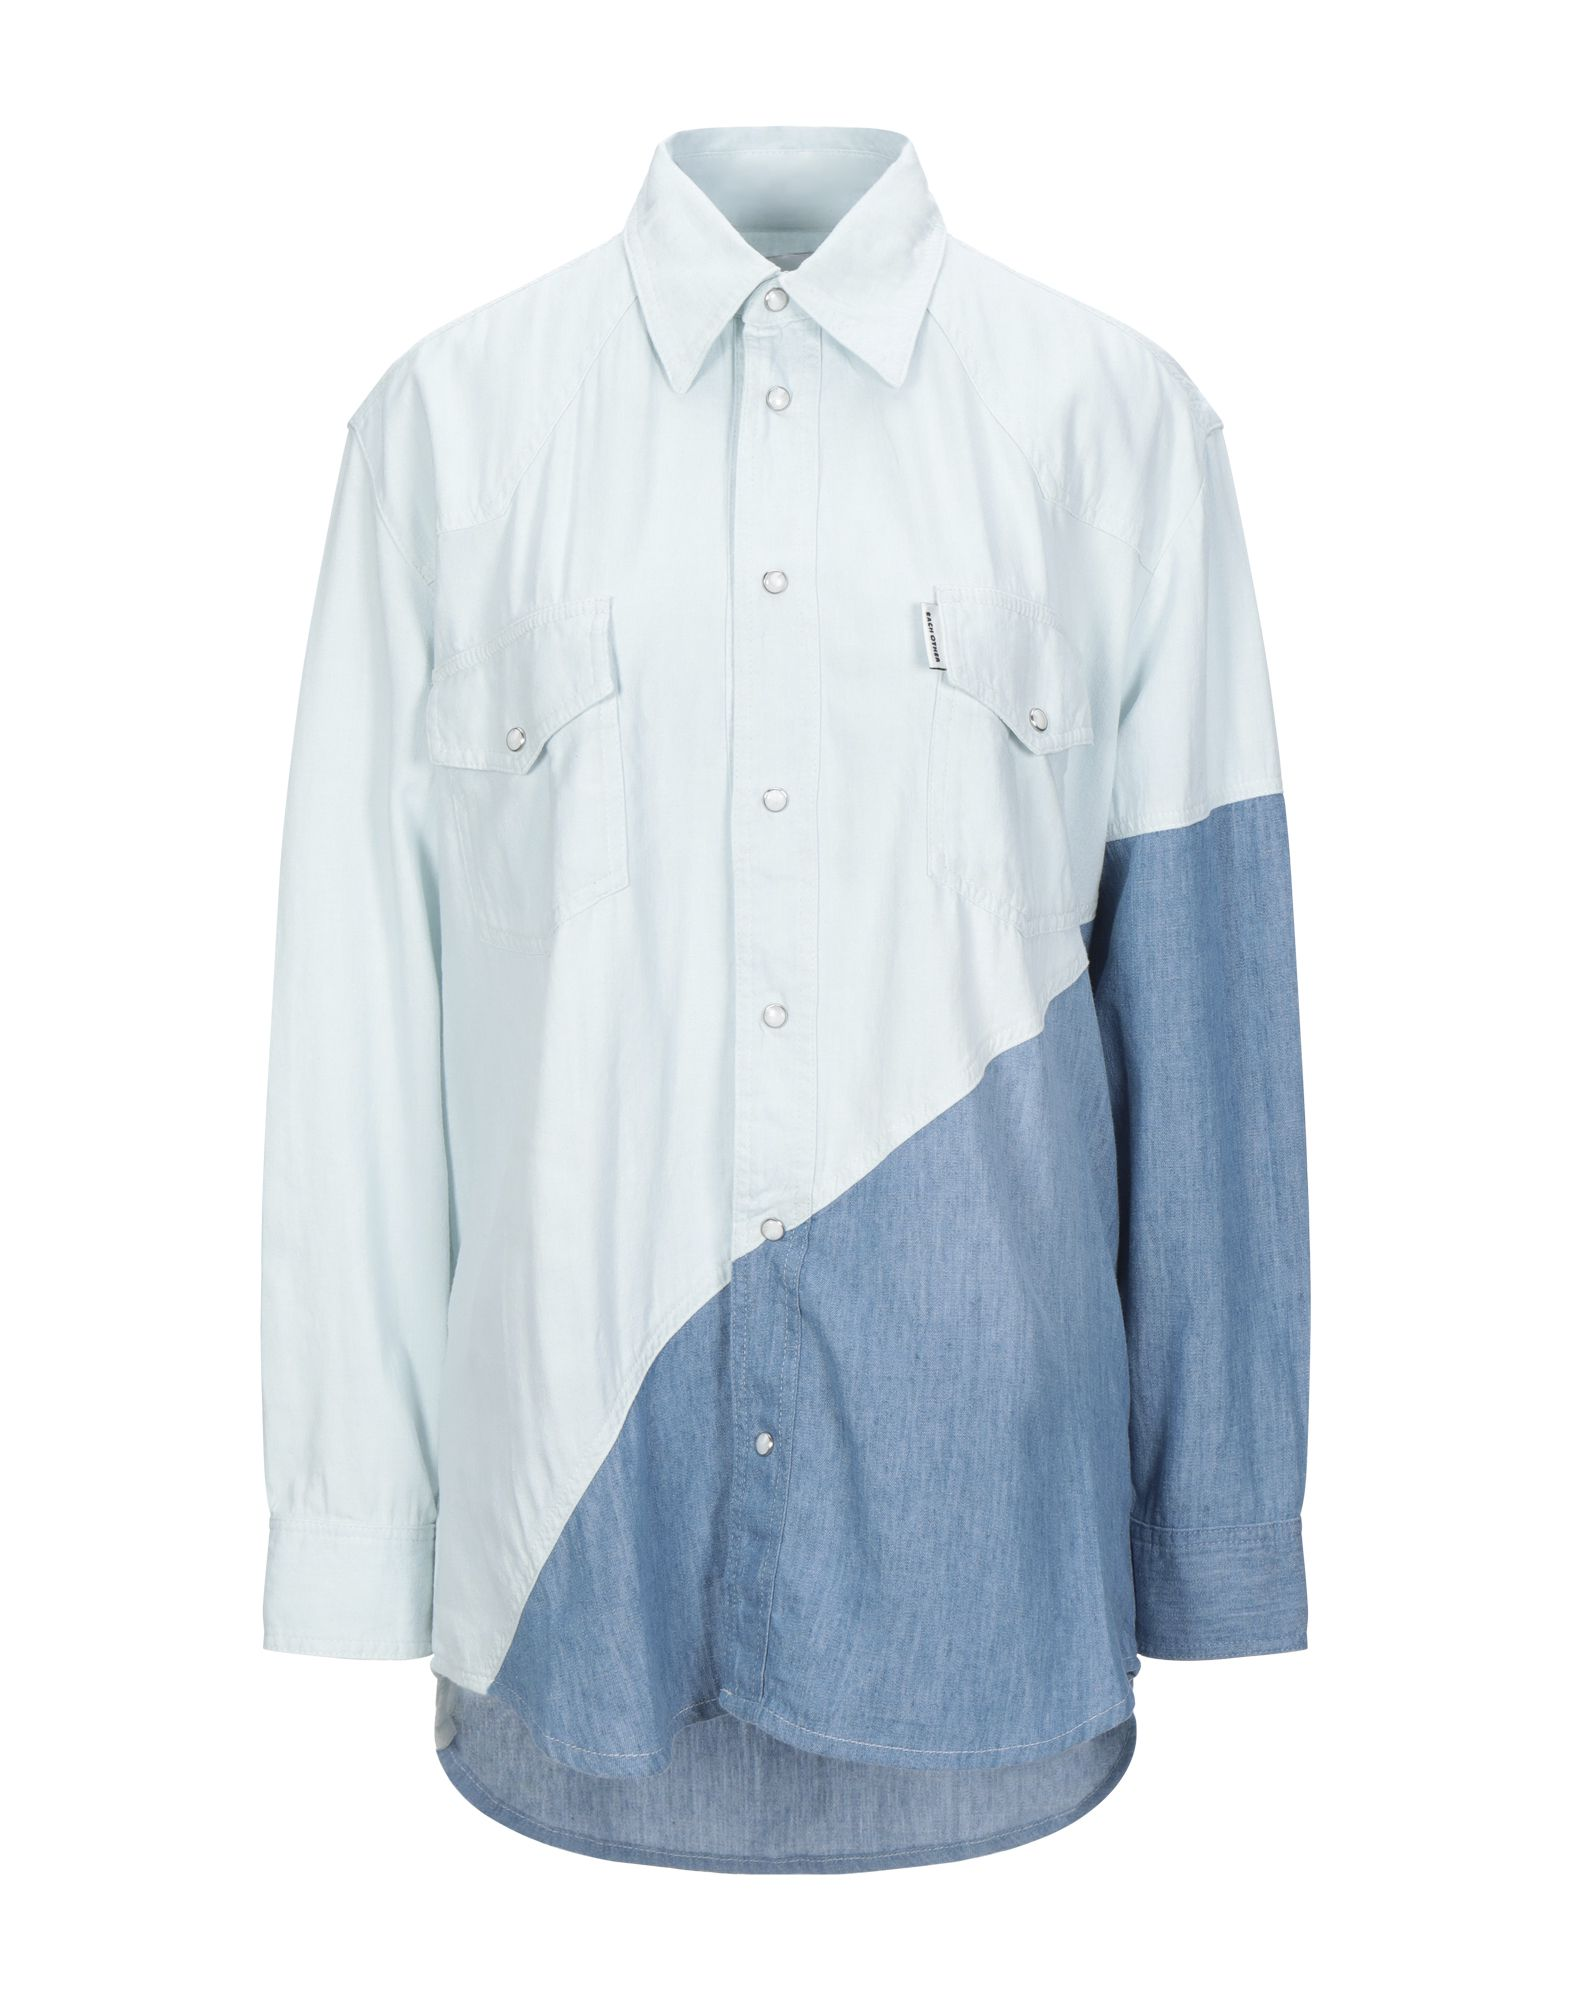 цена на EACH X OTHER Джинсовая рубашка